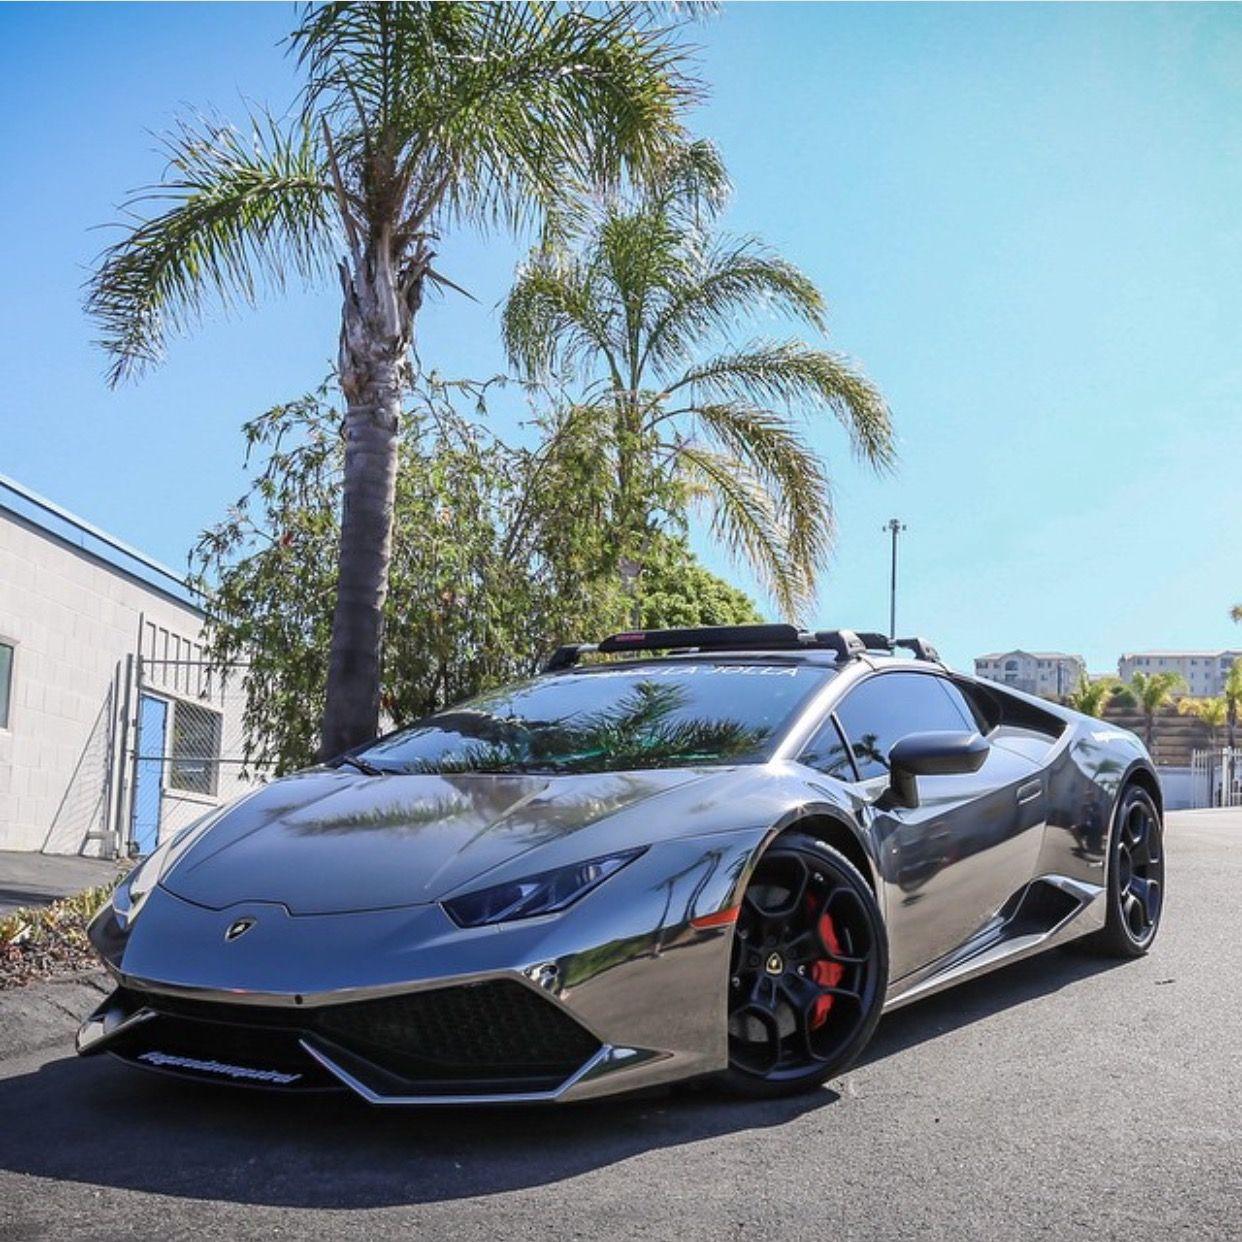 Lamborghini Huracan wrapped in Black Chrome Photo taken by ... on